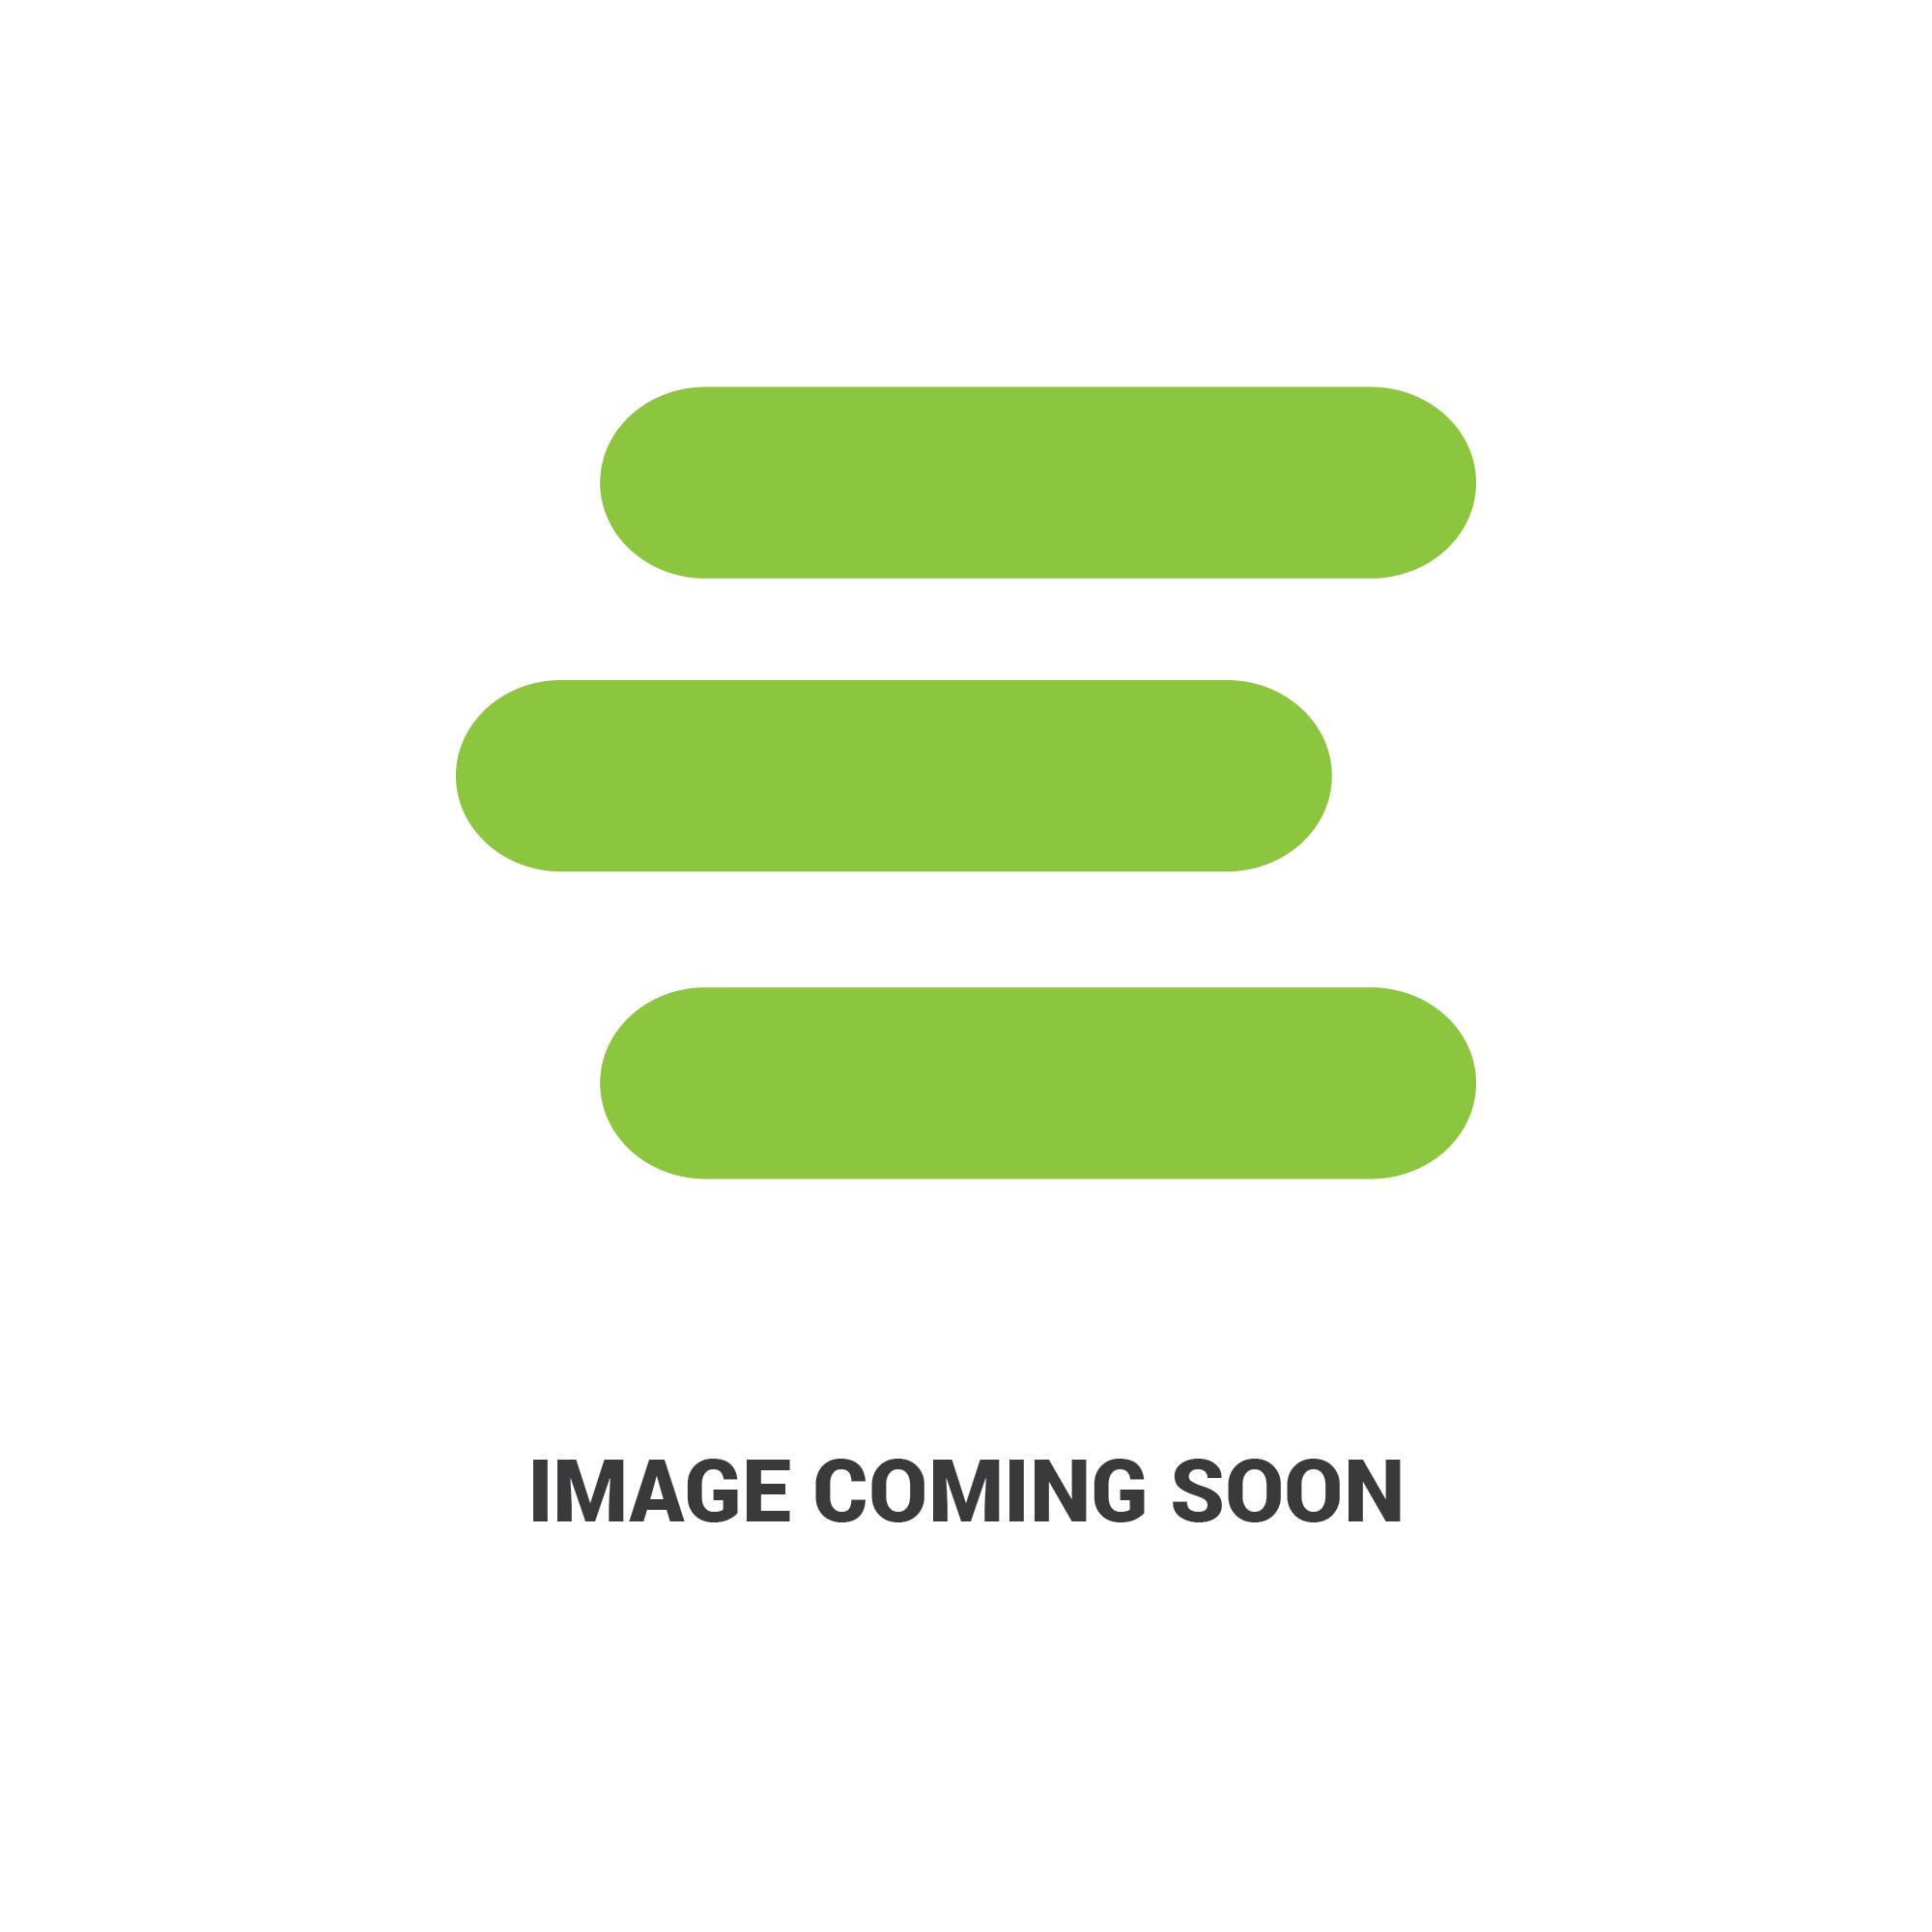 E-BK0071430_1.jpg